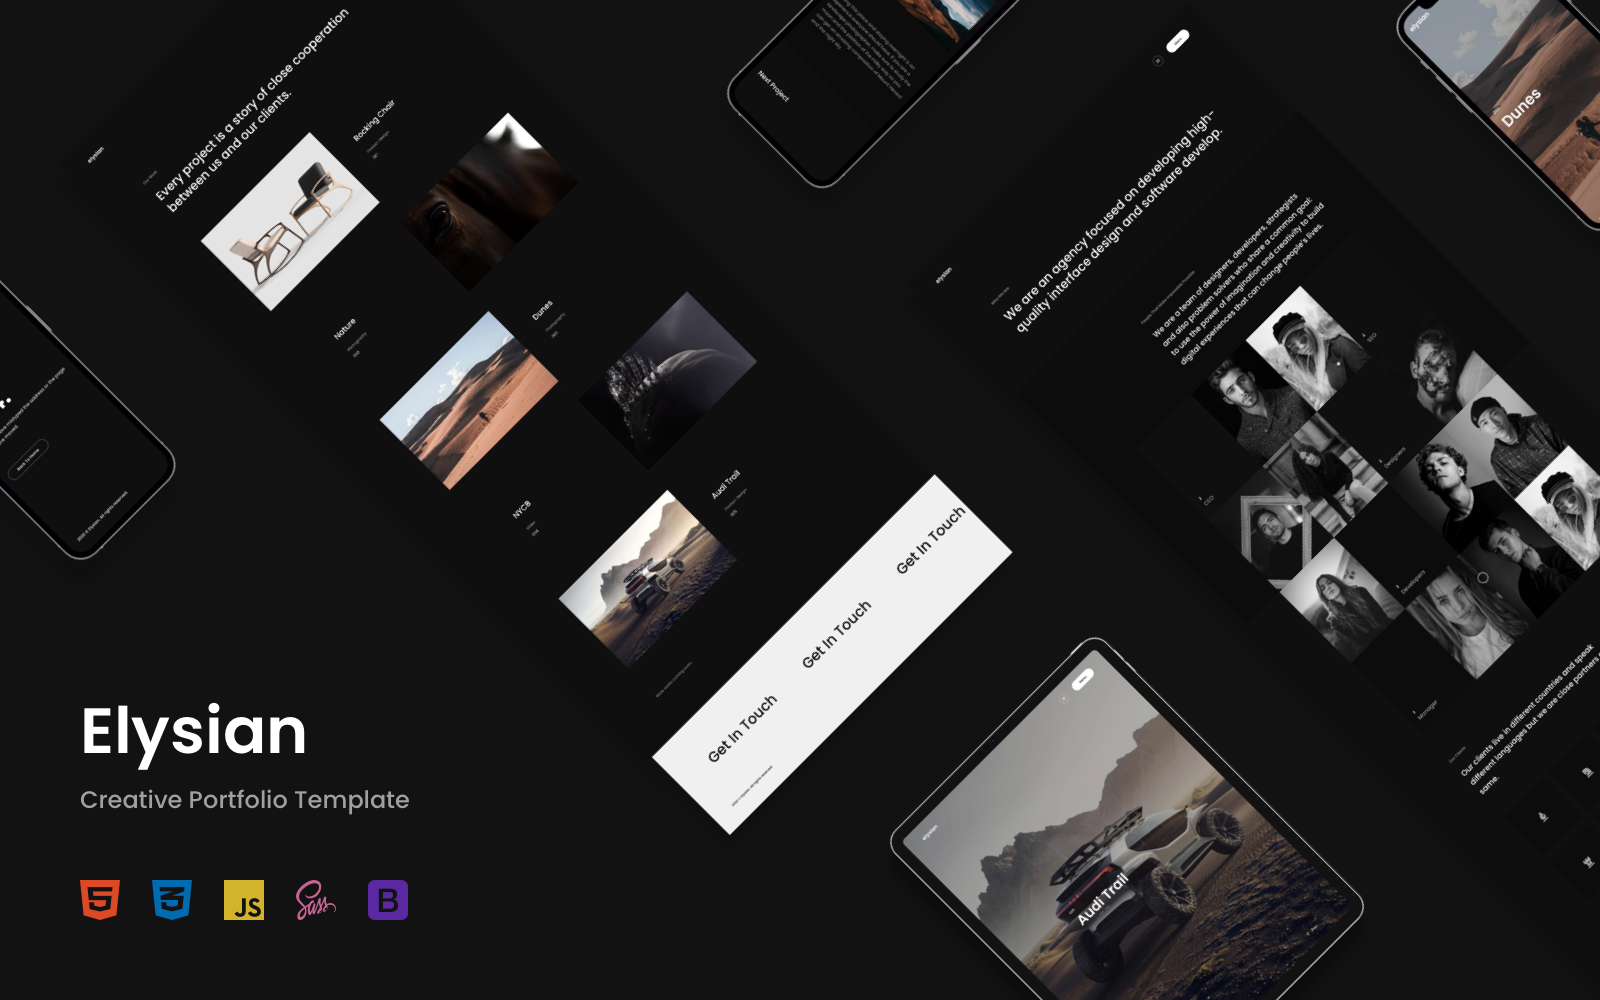 Elysian - Creative Portfolio Landing Page Template